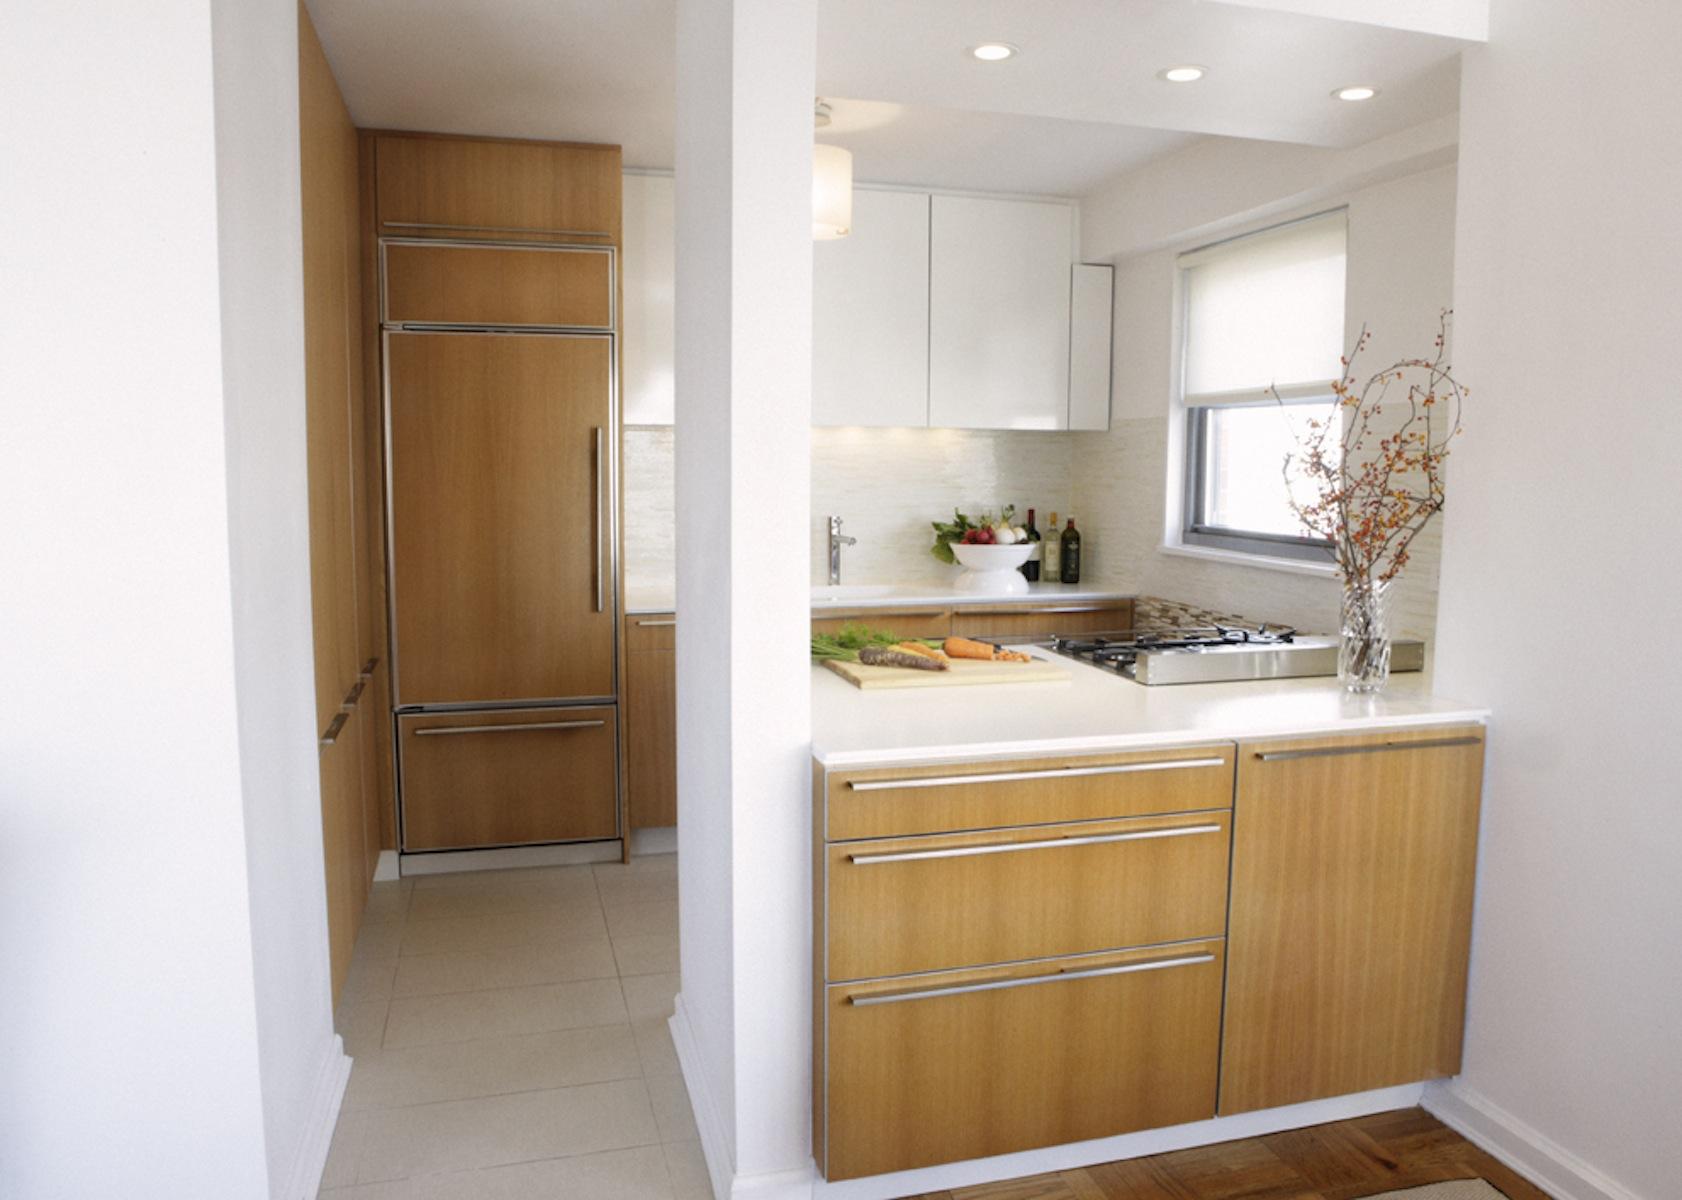 1 Kitchen.jpeg